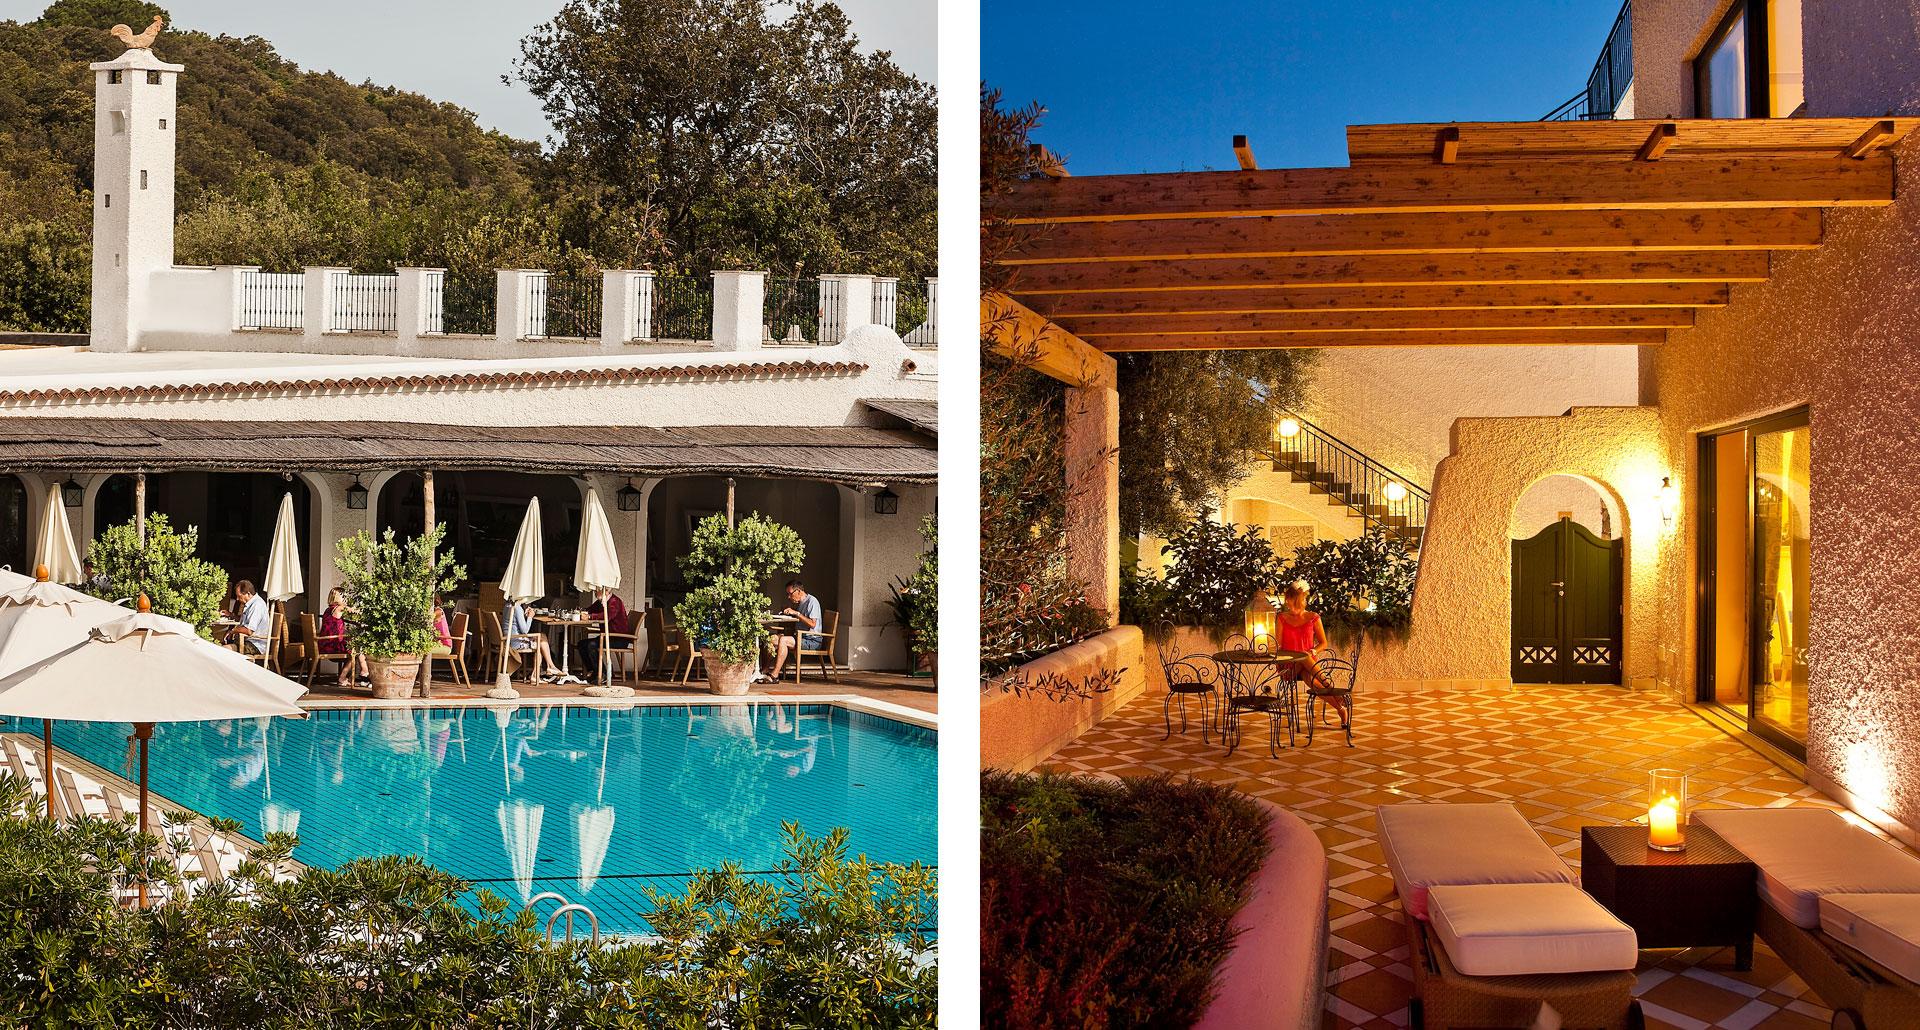 Garden & Villas Resort - boutique hotel in Ischia